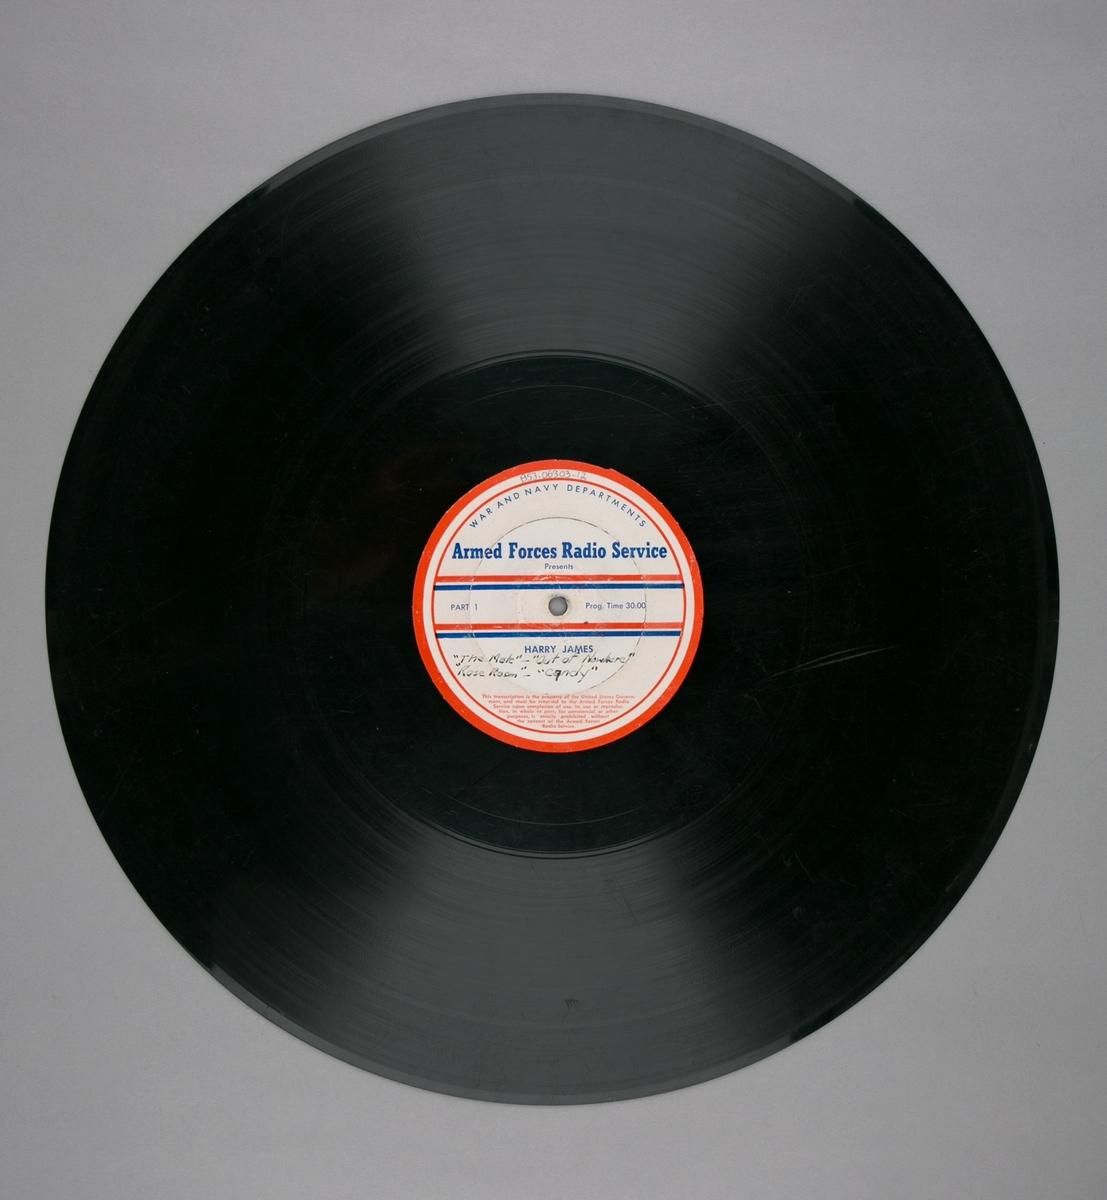 "Grammofonplatesamling. LP-plate med tittel ""Armed Forces Radio Service"" utgitt av War and Navy Departements. Plate i svart vinyl spilles på platespiller med 33 1/3 omdreininger i minuttet (33-plate)."